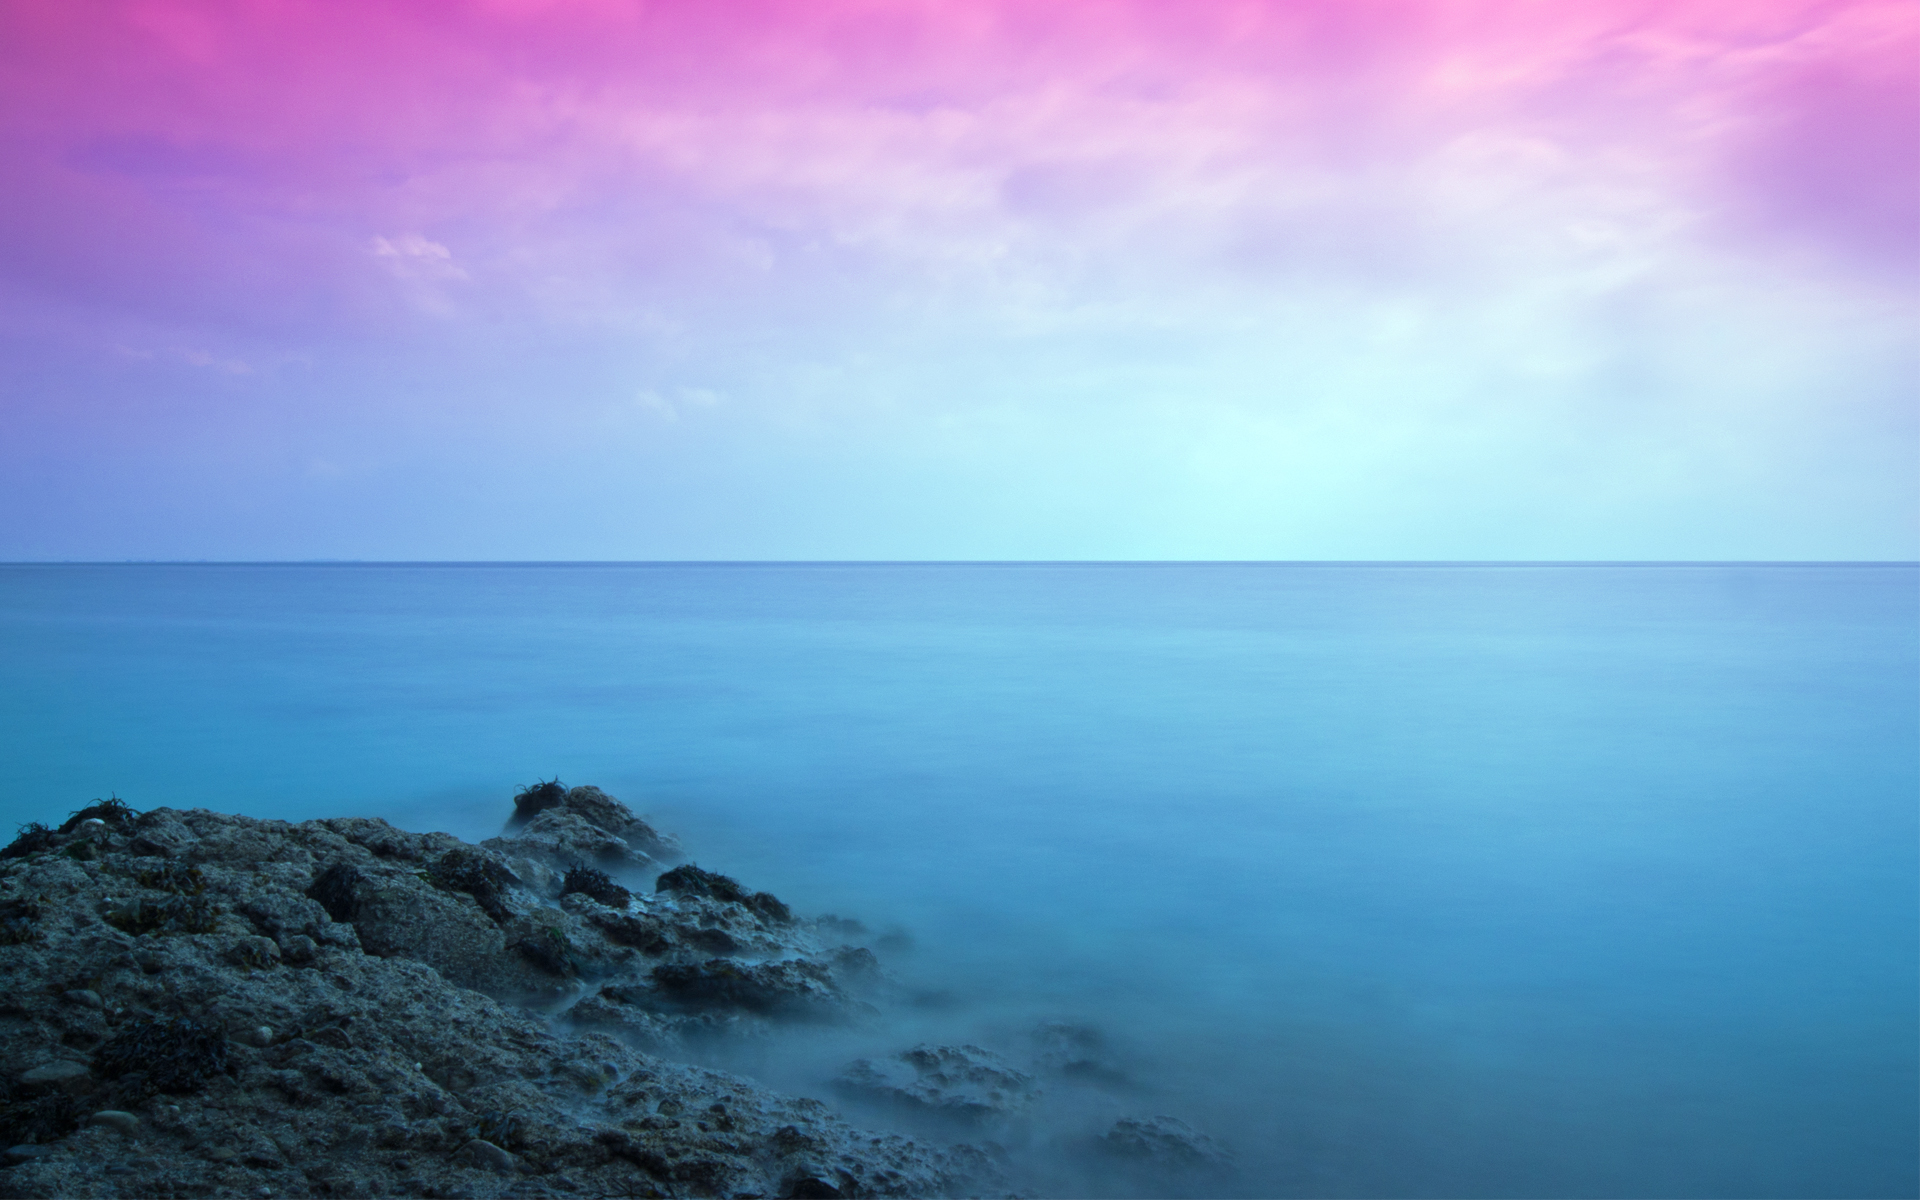 cool seascape wallpaper 29212